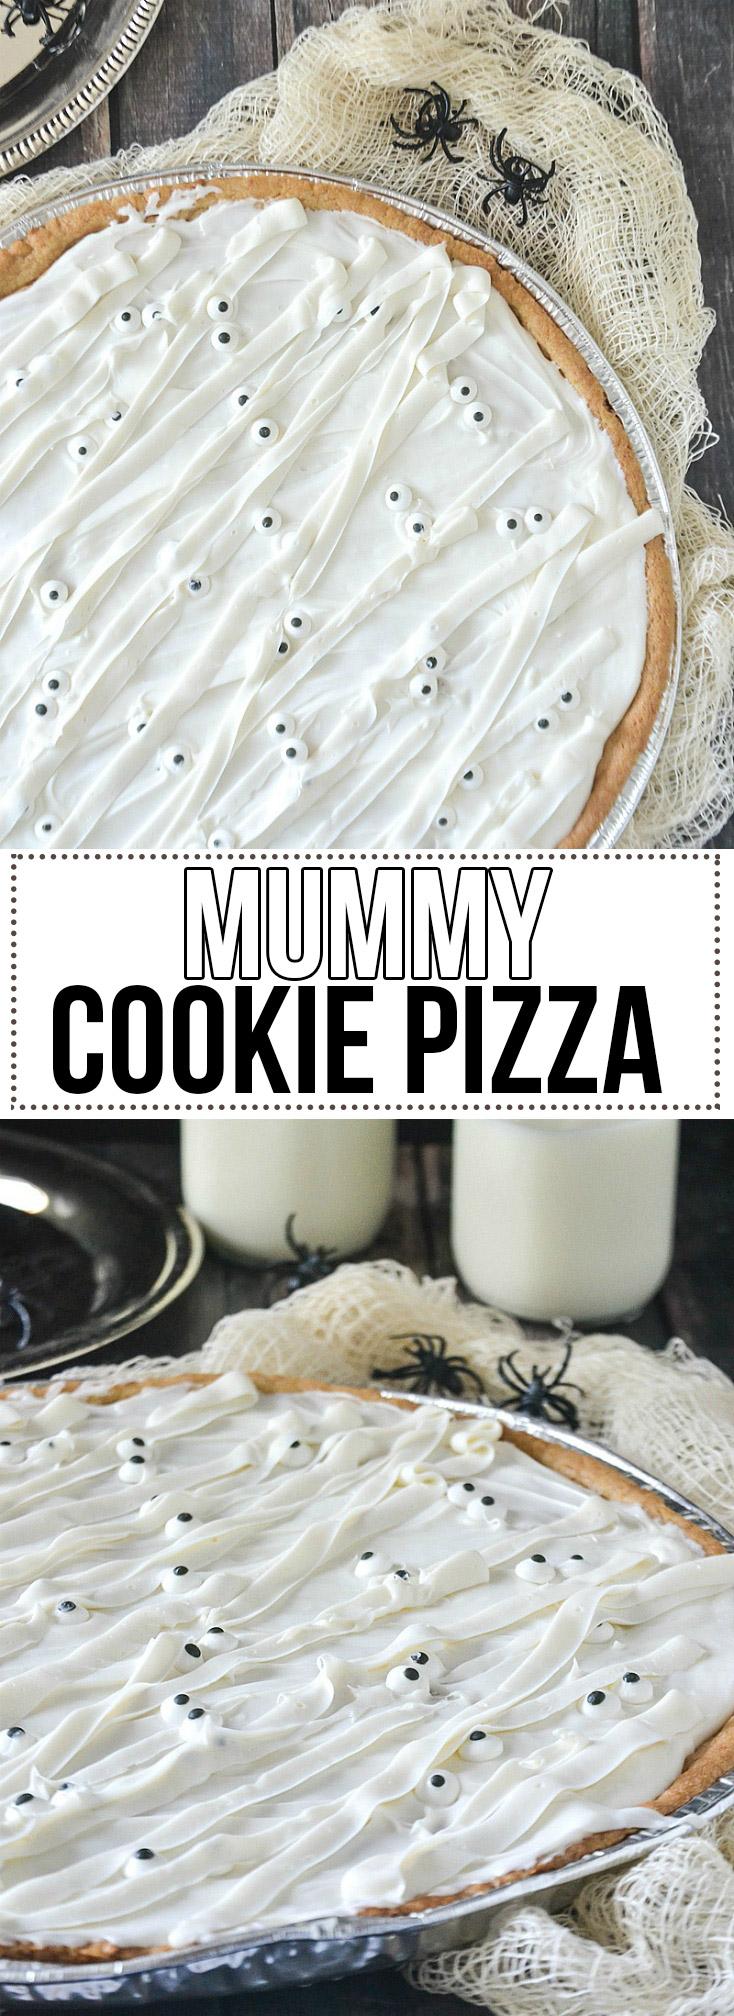 Mummy Cookie Pizza - www.motherthyme.com